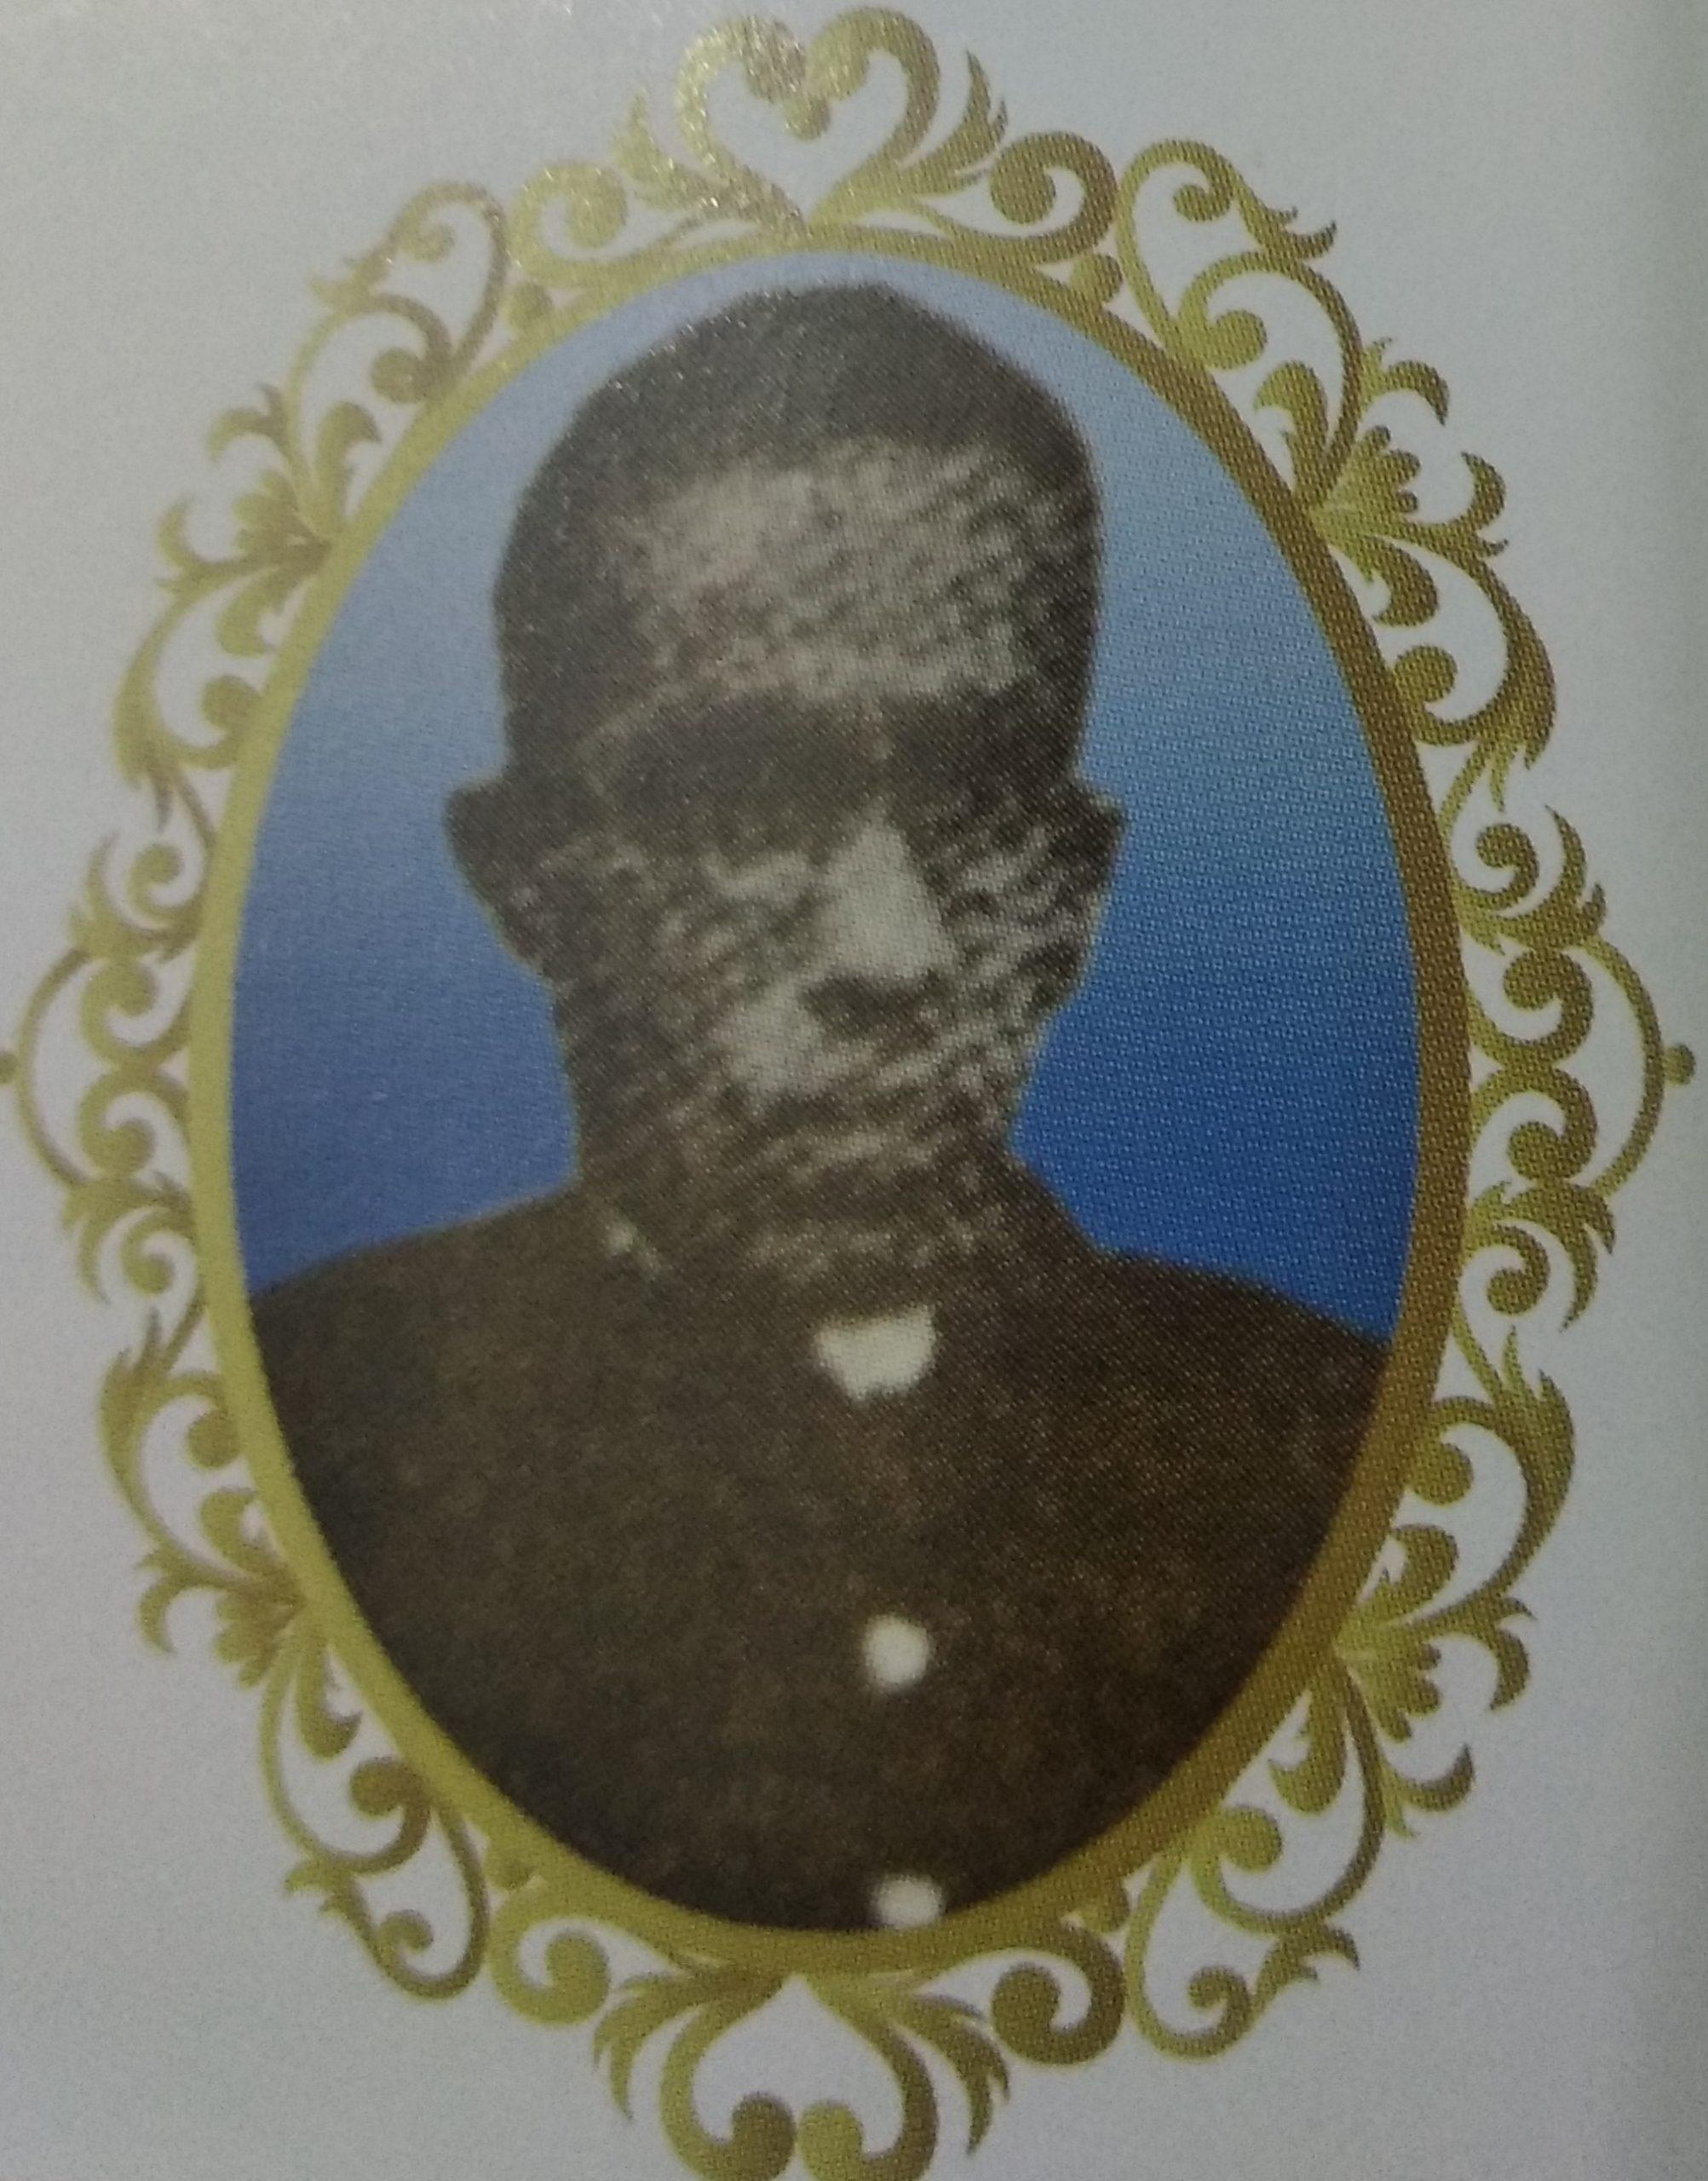 Fr. Augustine Chakkalaparambil